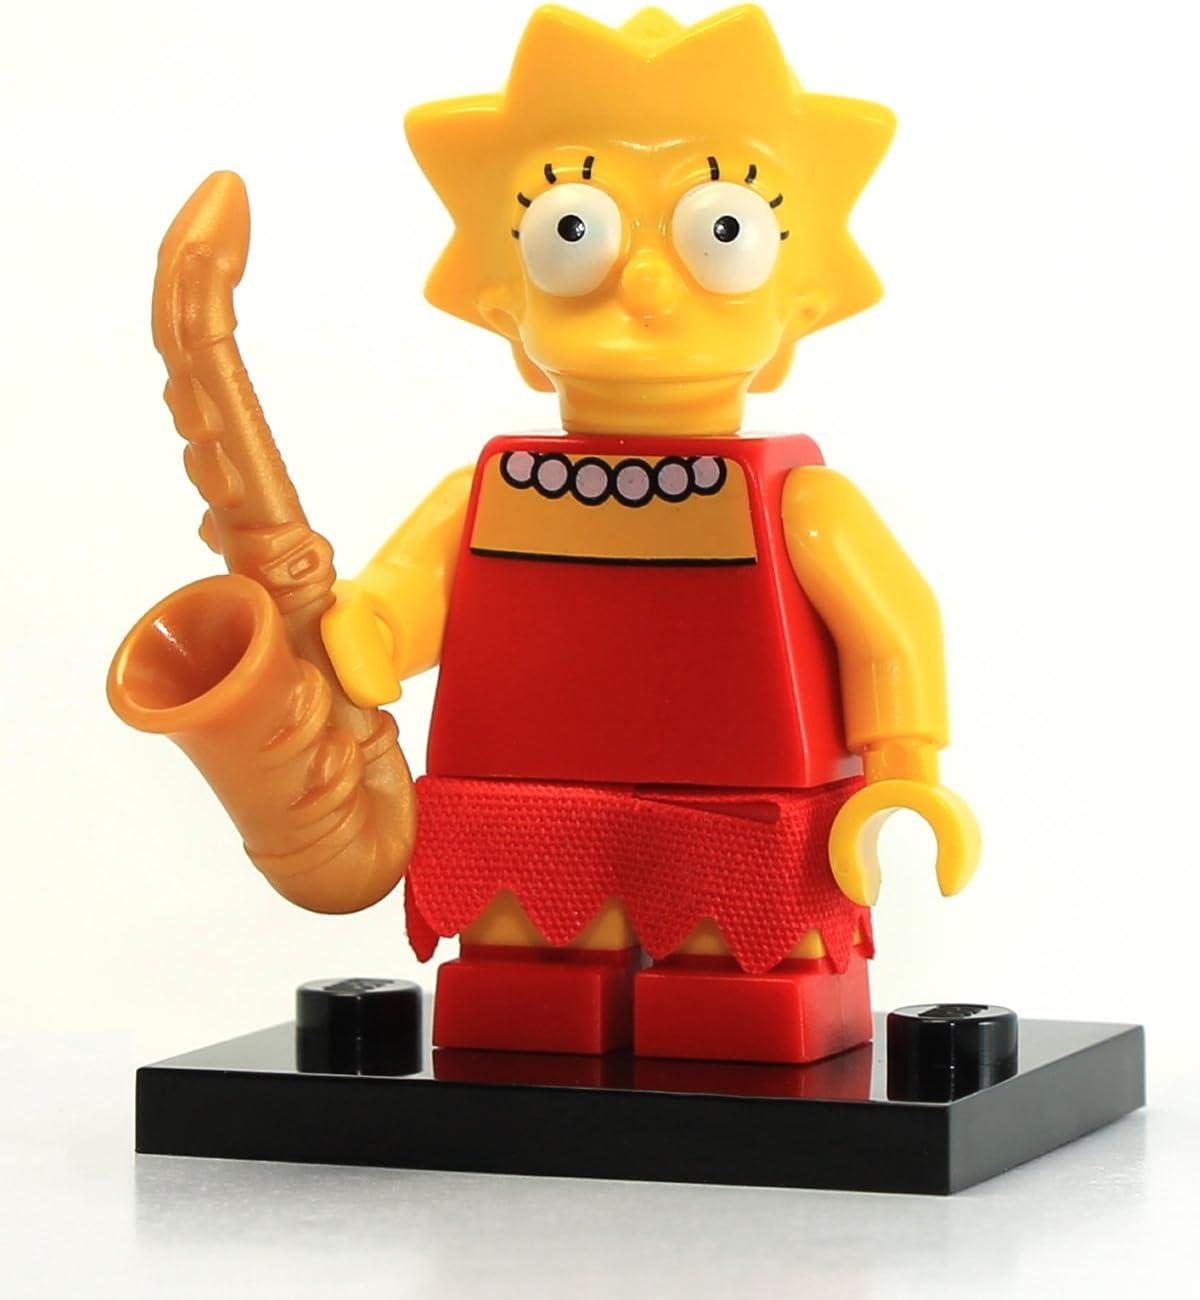 Collectible Minifigure // The Simpsons LEGO 71005 Lisa Simpson Mini Figure